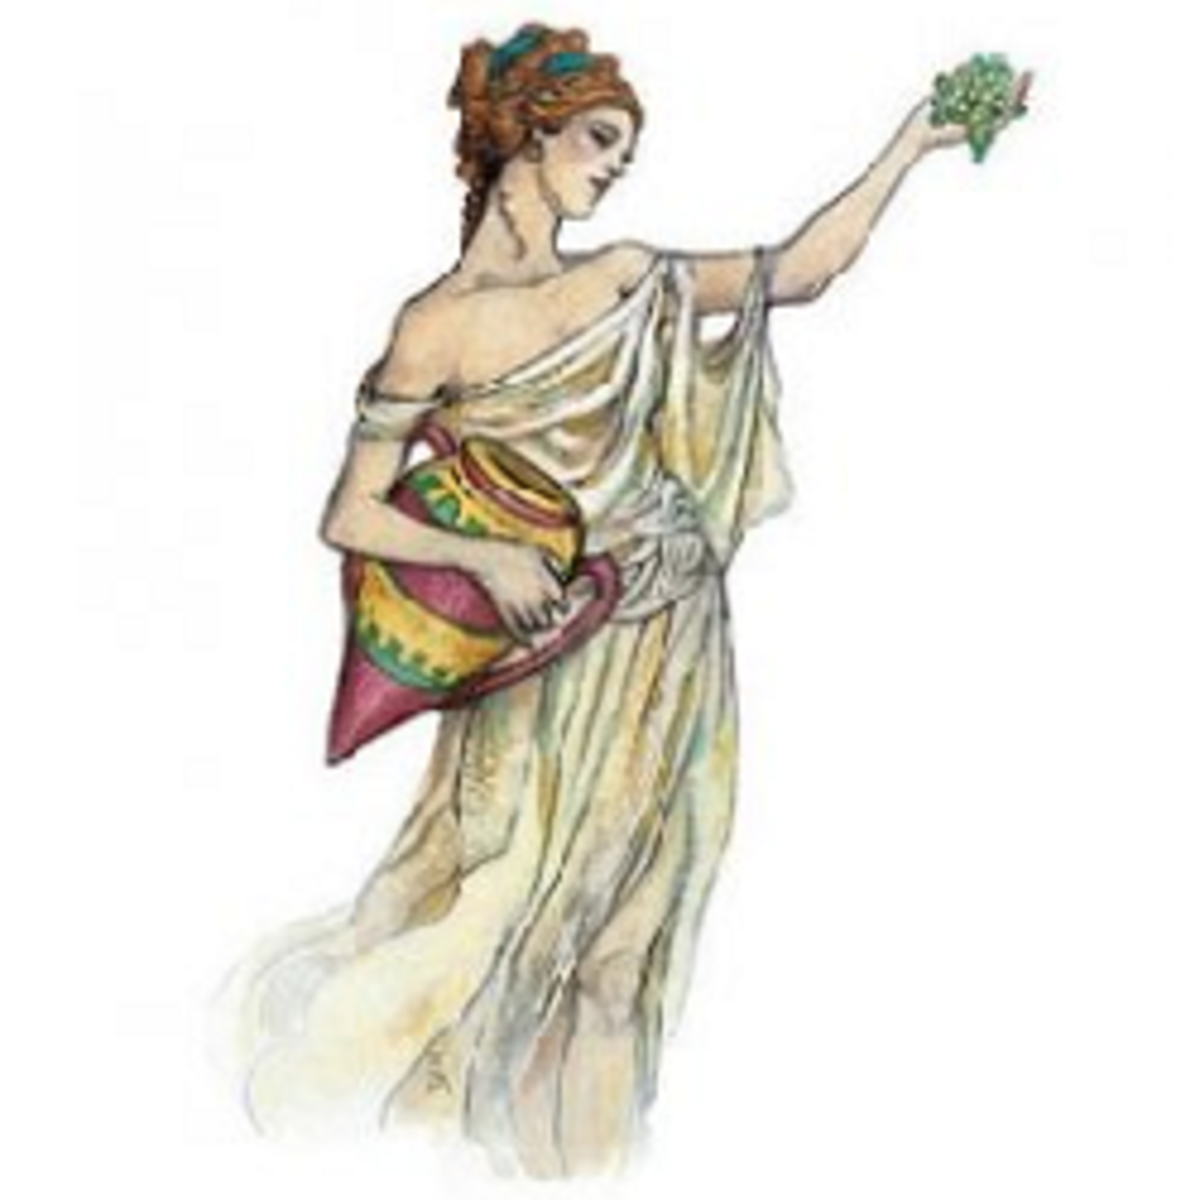 Hestia, Ancient Greek Goddess